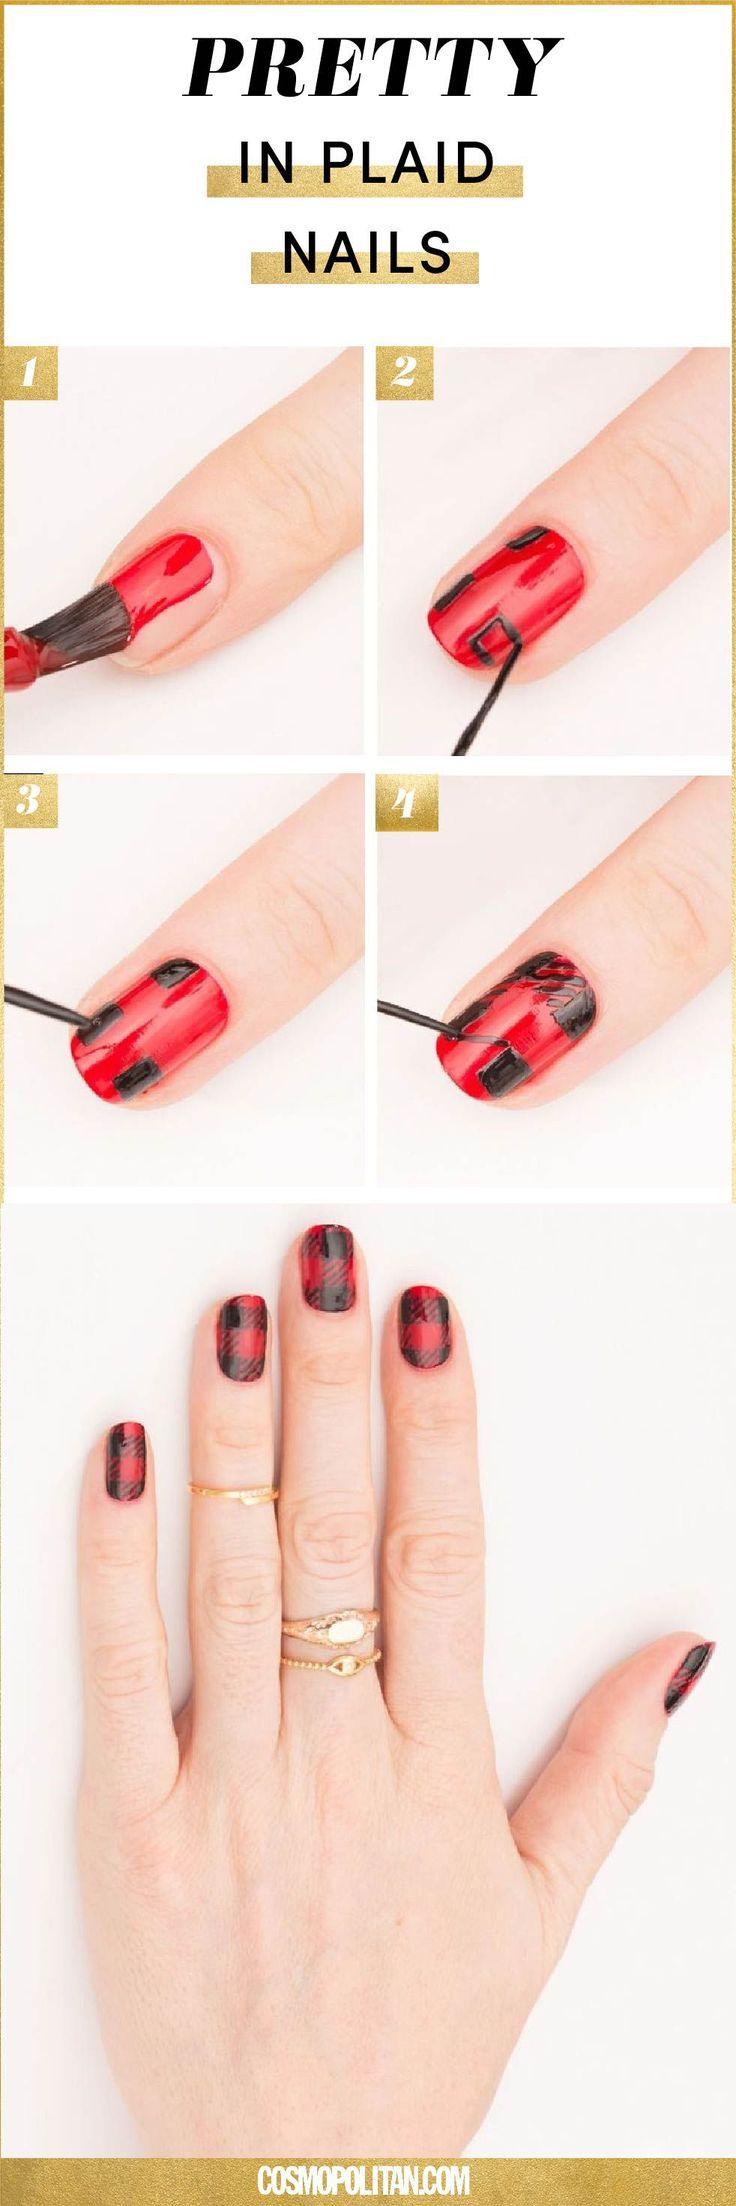 18 best Nail Art Trends images on Pinterest   Nail design, Belle ...